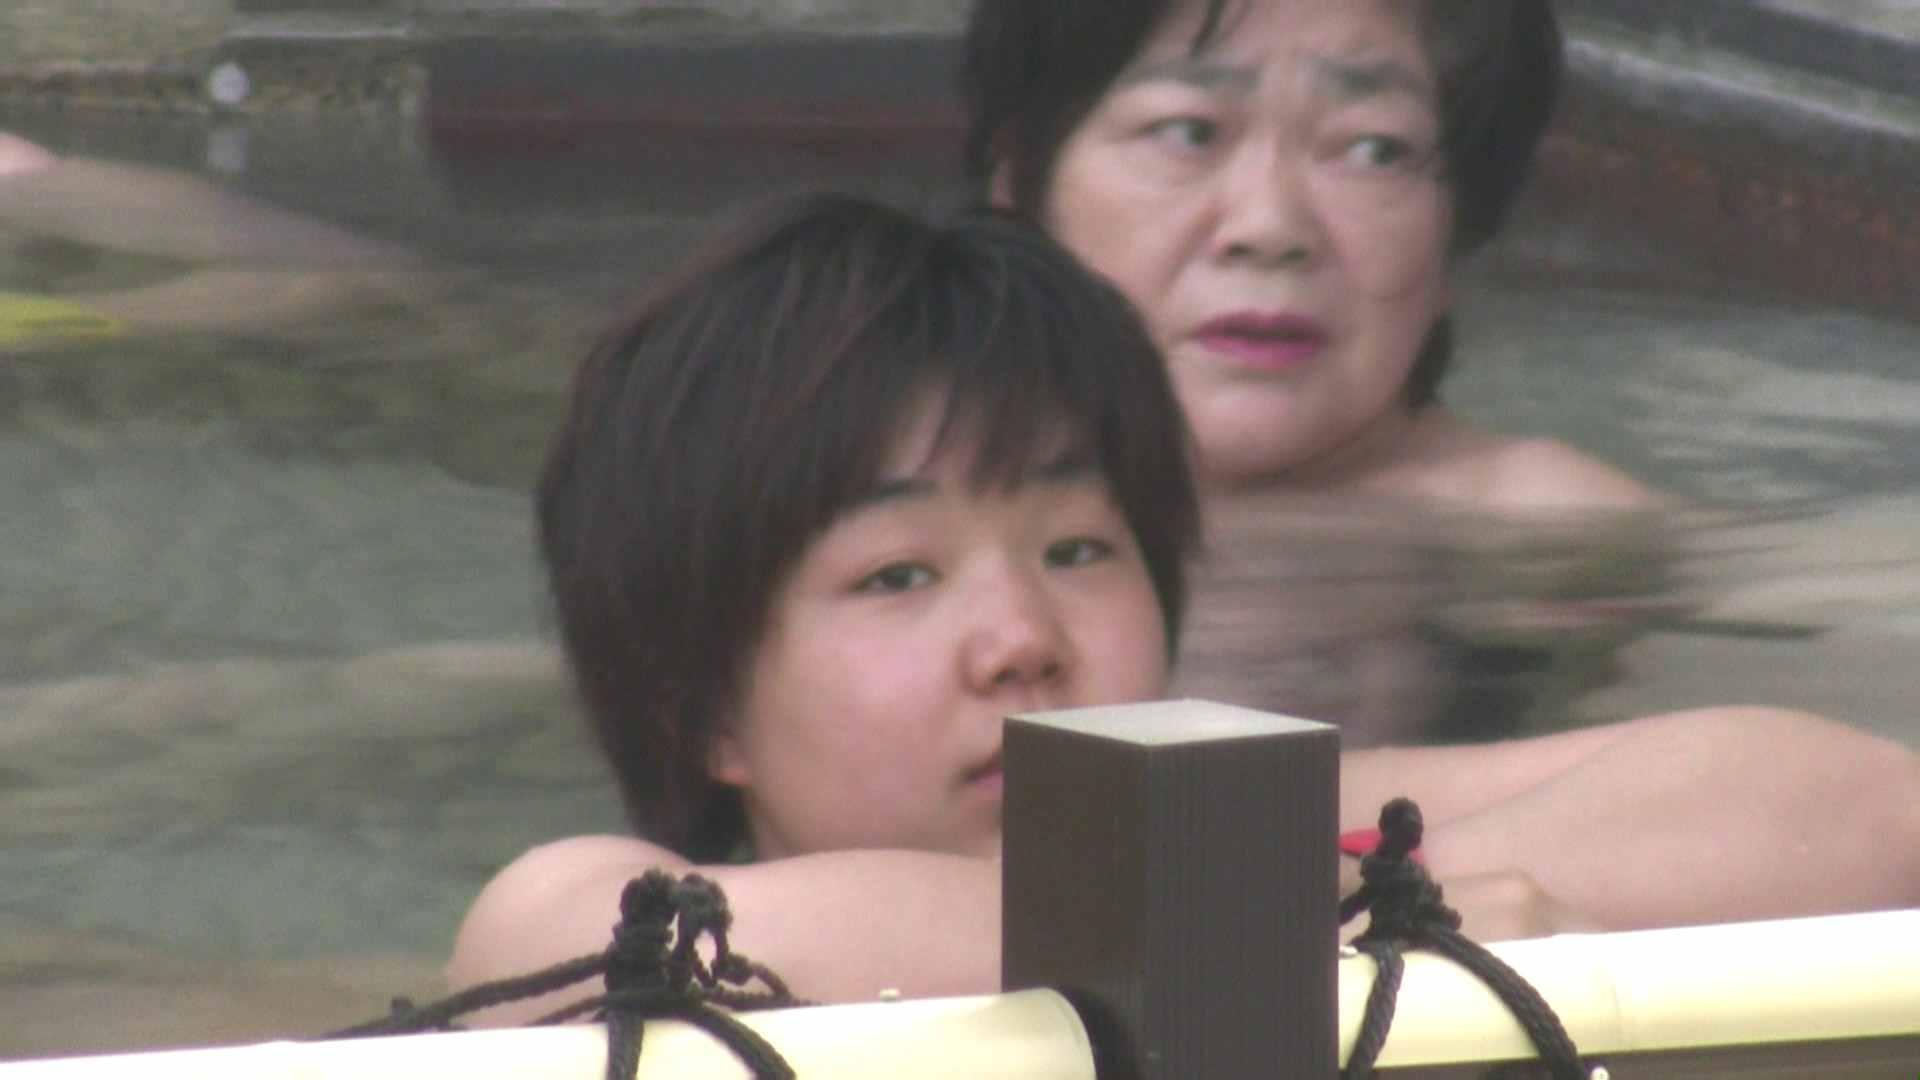 Aquaな露天風呂Vol.53【VIP限定】 女体盗撮  93連発 24